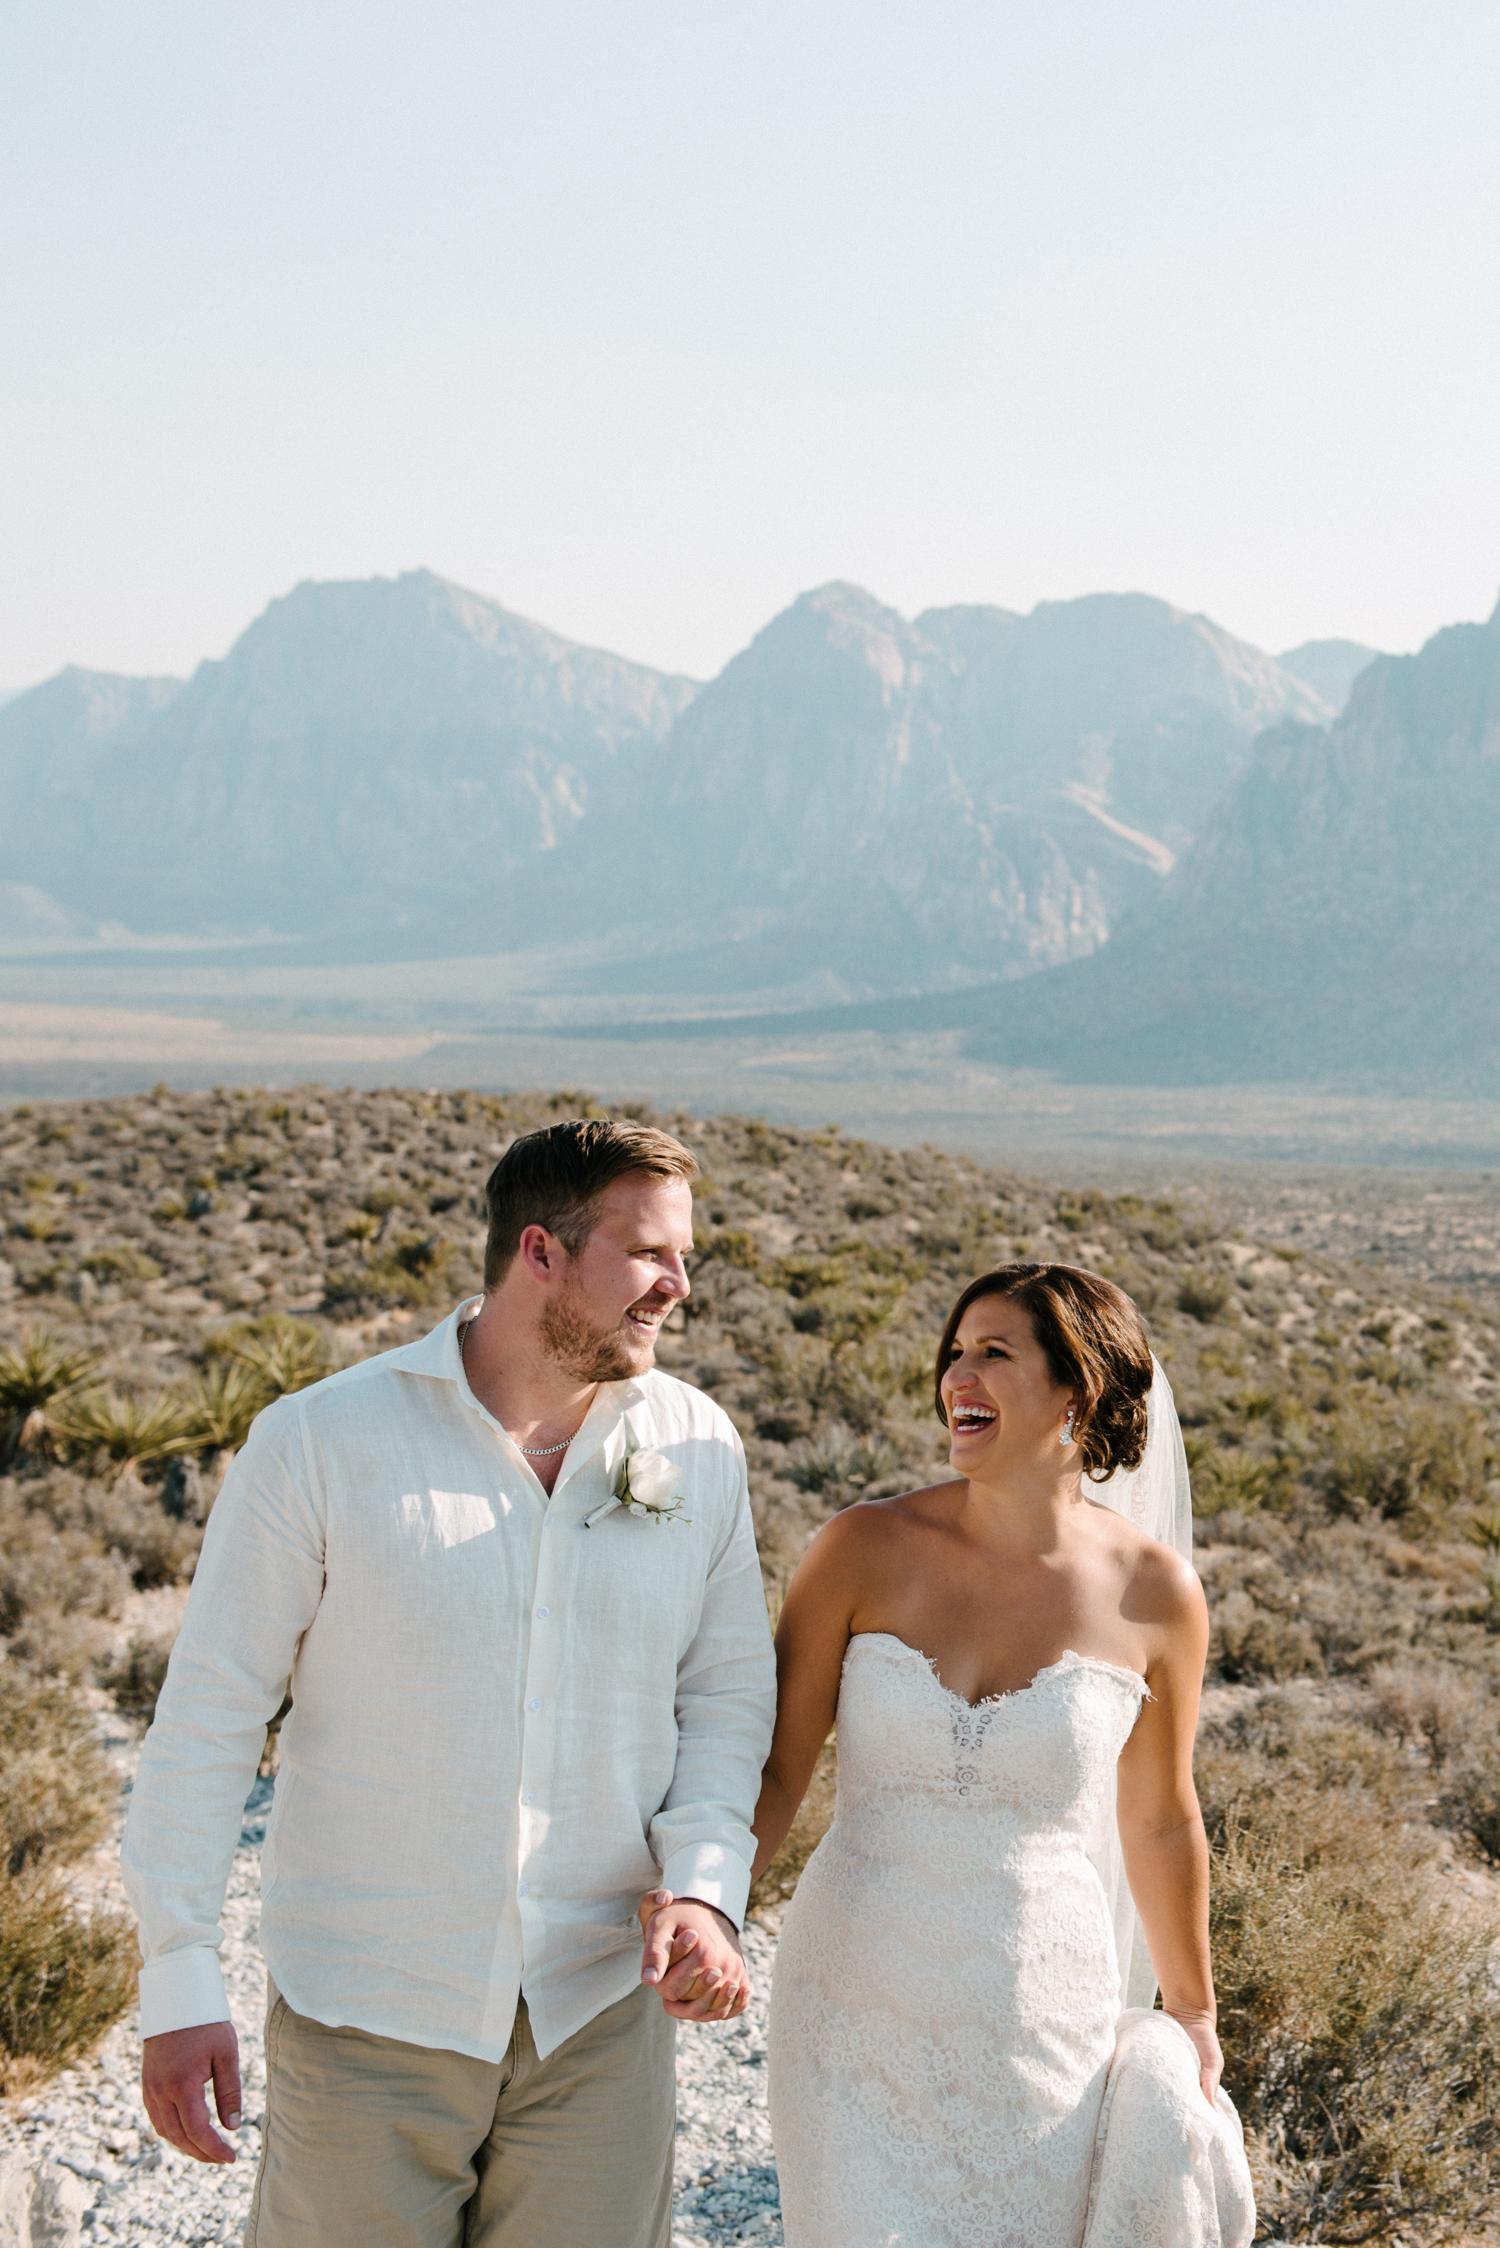 045_Redrock_canyon_vegas_wedding_photographer.jpg